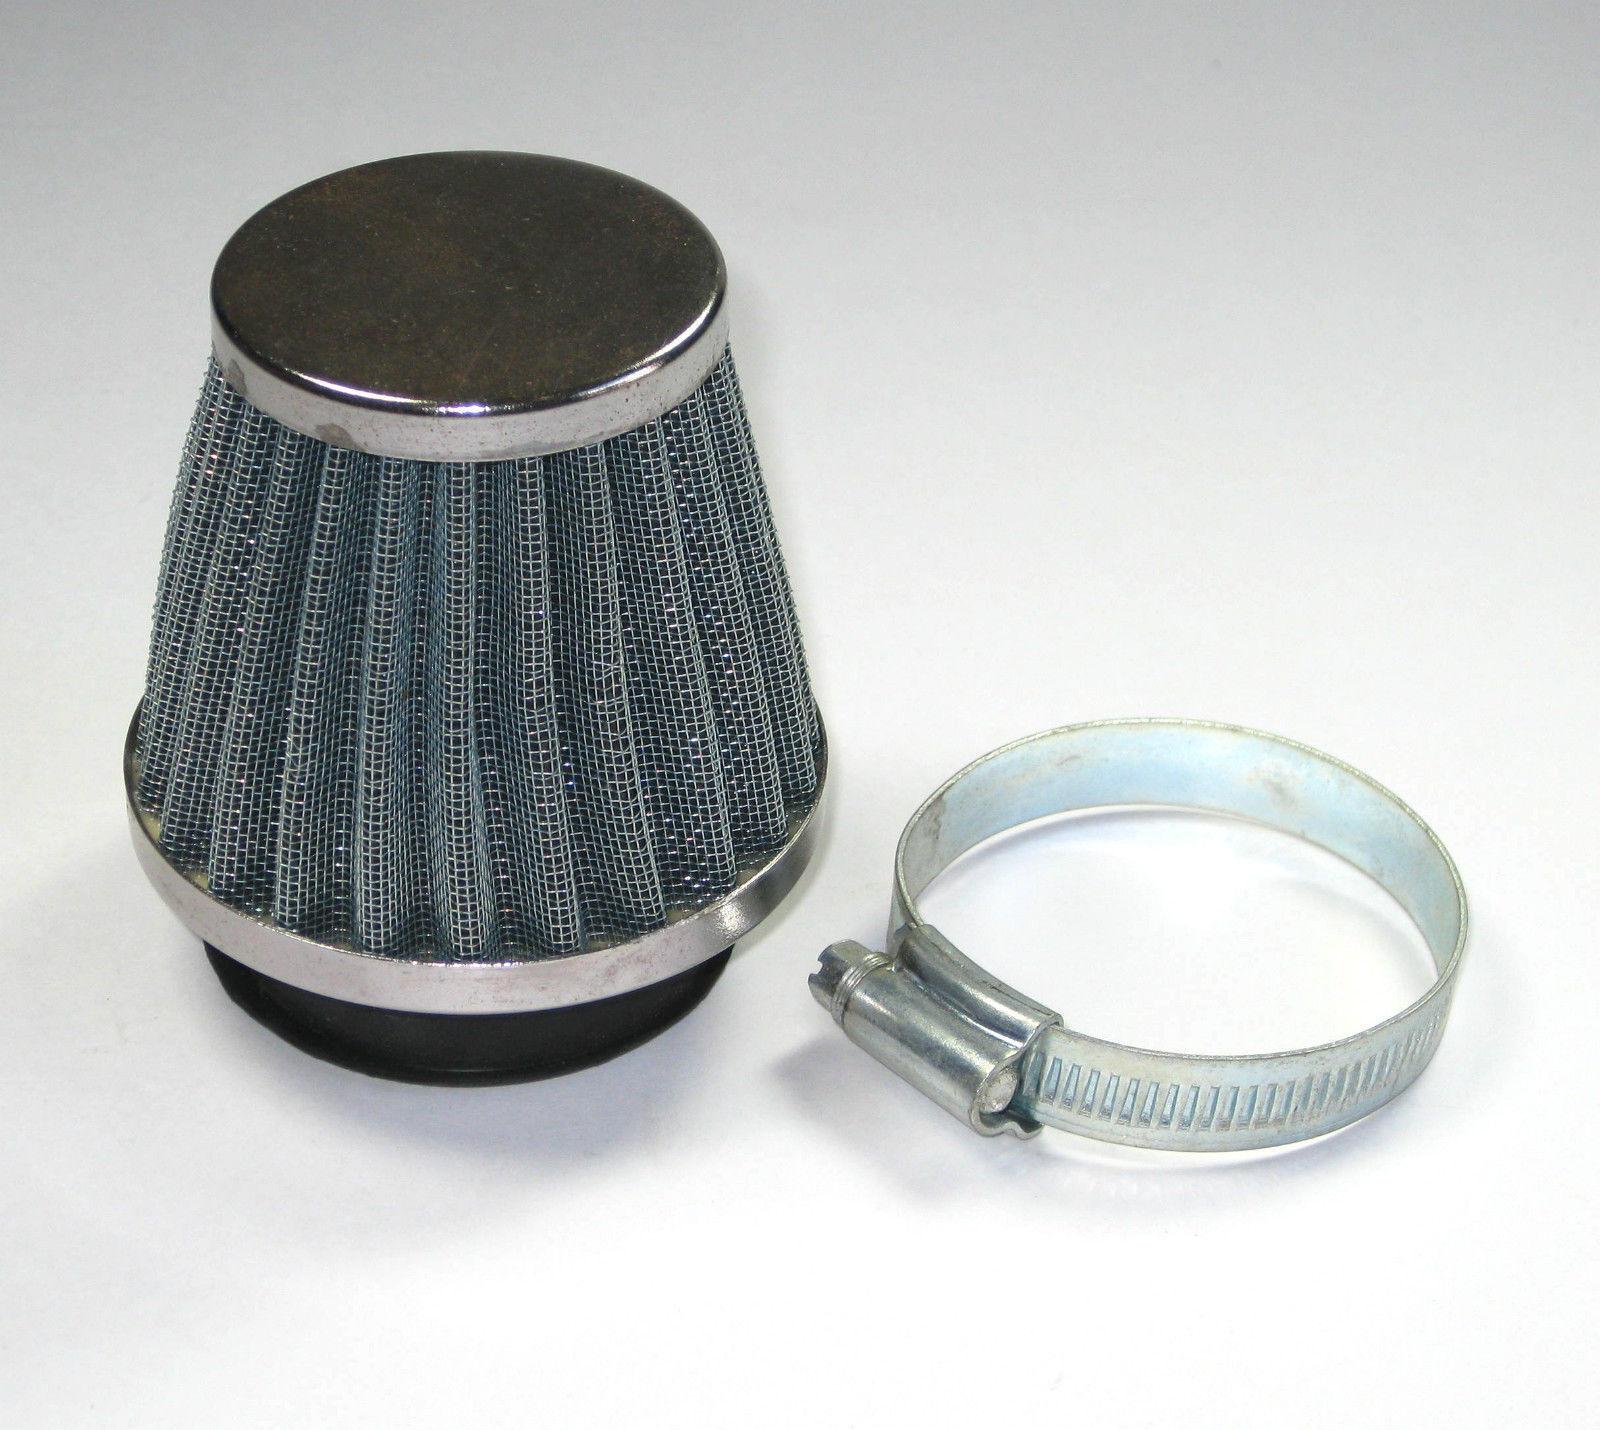 Baja 70cc dirt bike air filter kit ebay picture 1 of 2 sciox Gallery